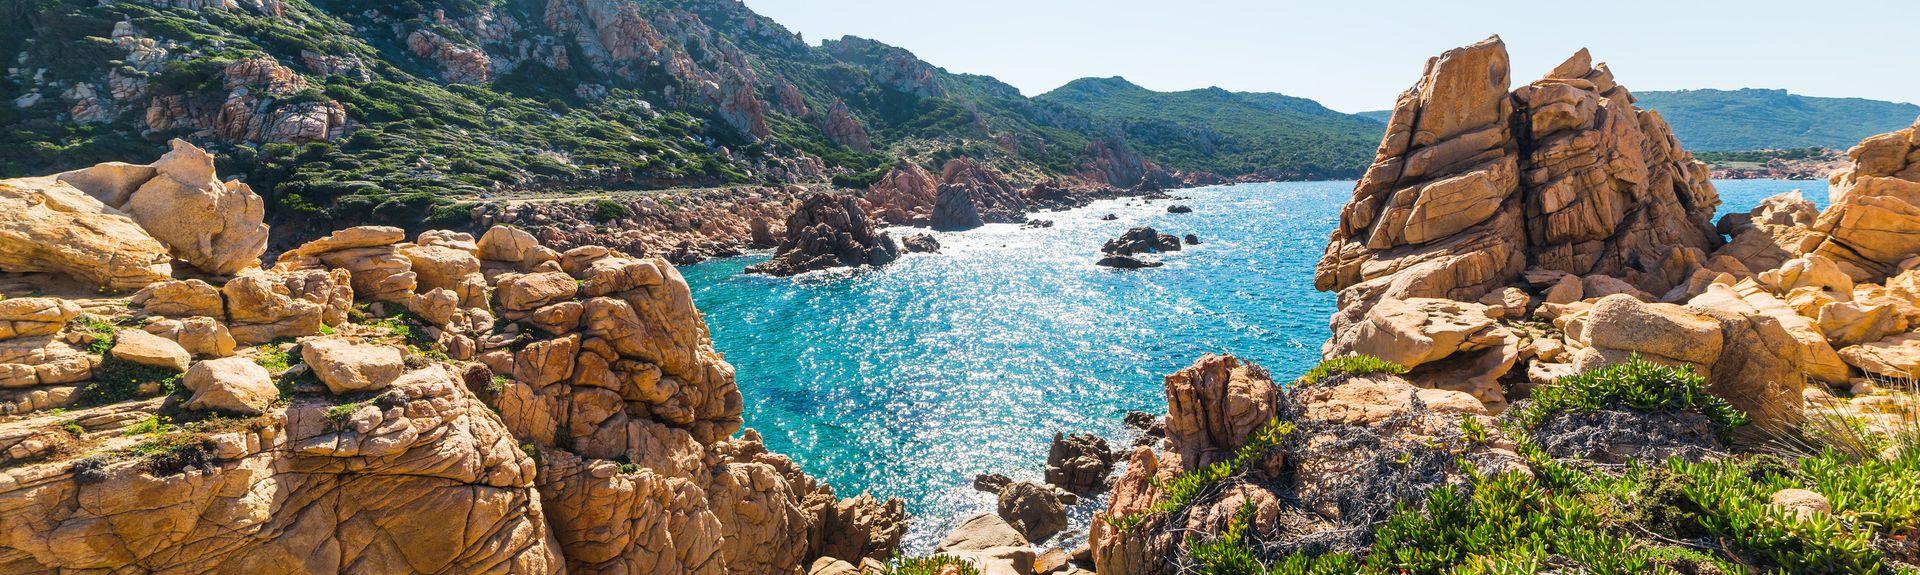 Costa Paradiso, Sardynia, Włochy